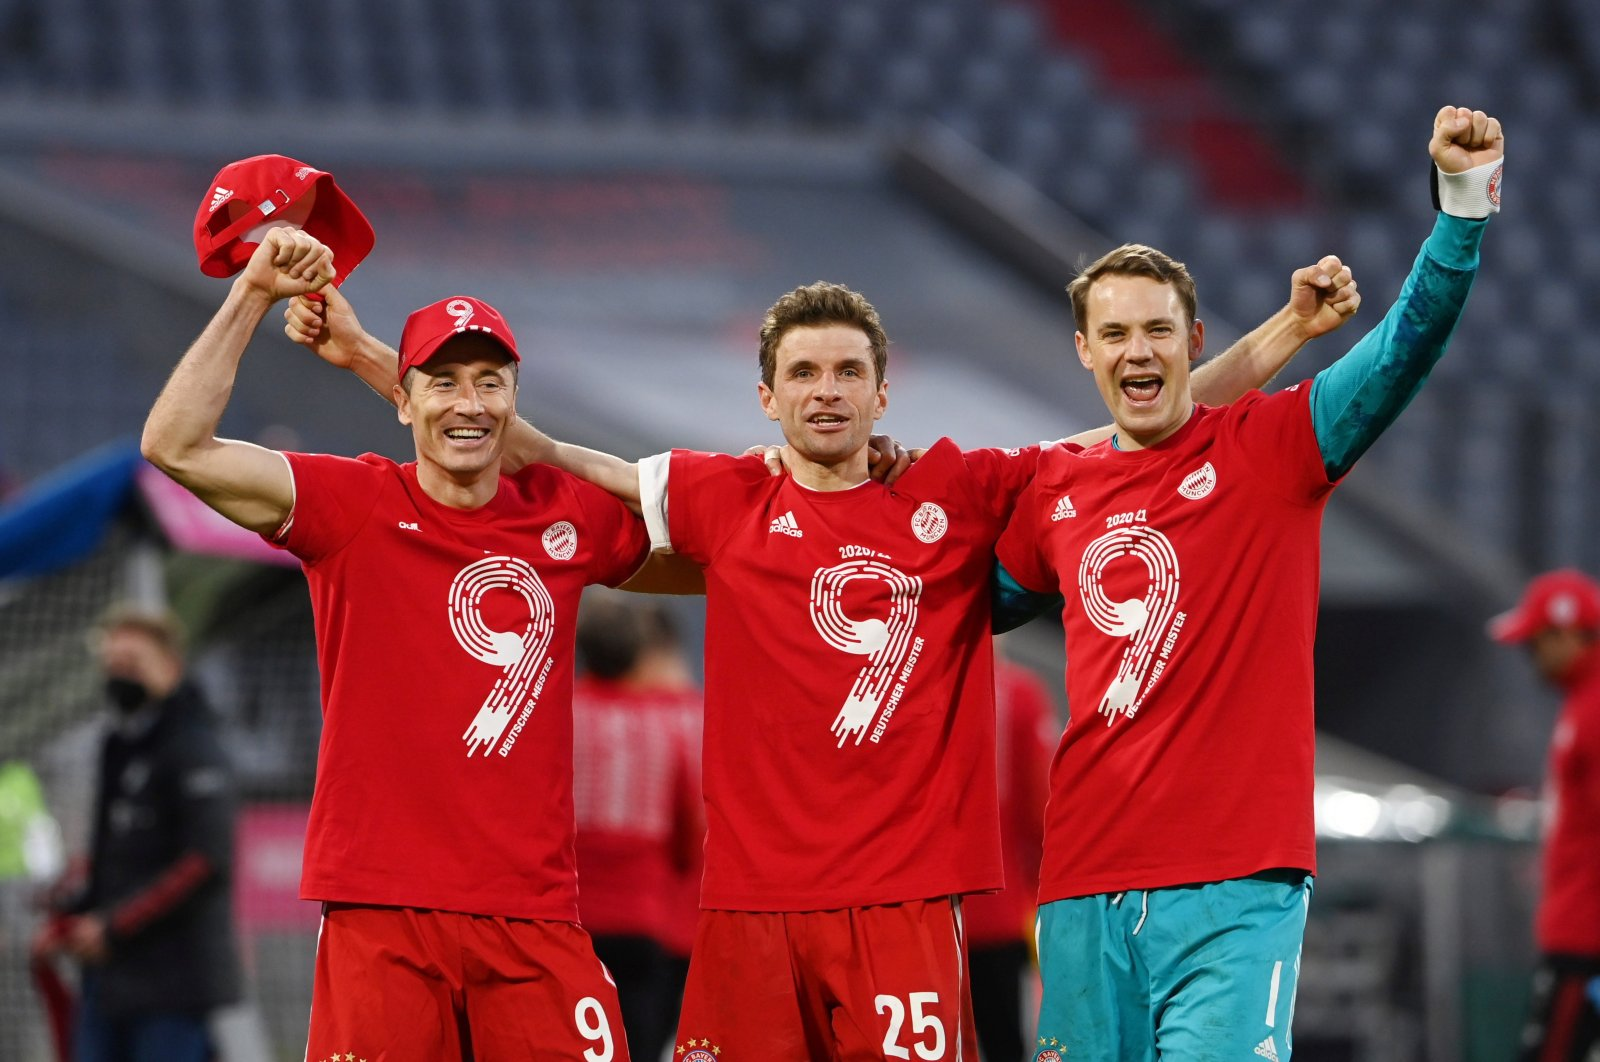 Bayern Munich's Thomas Muller, Manuel Neuer and Robert Lewandowski celebrate winning the Bundesliga after a match against Borussia Monchengladbach at the Allianz Arena, Munich, Germany, May 8, 2021. (Reuters Photos)